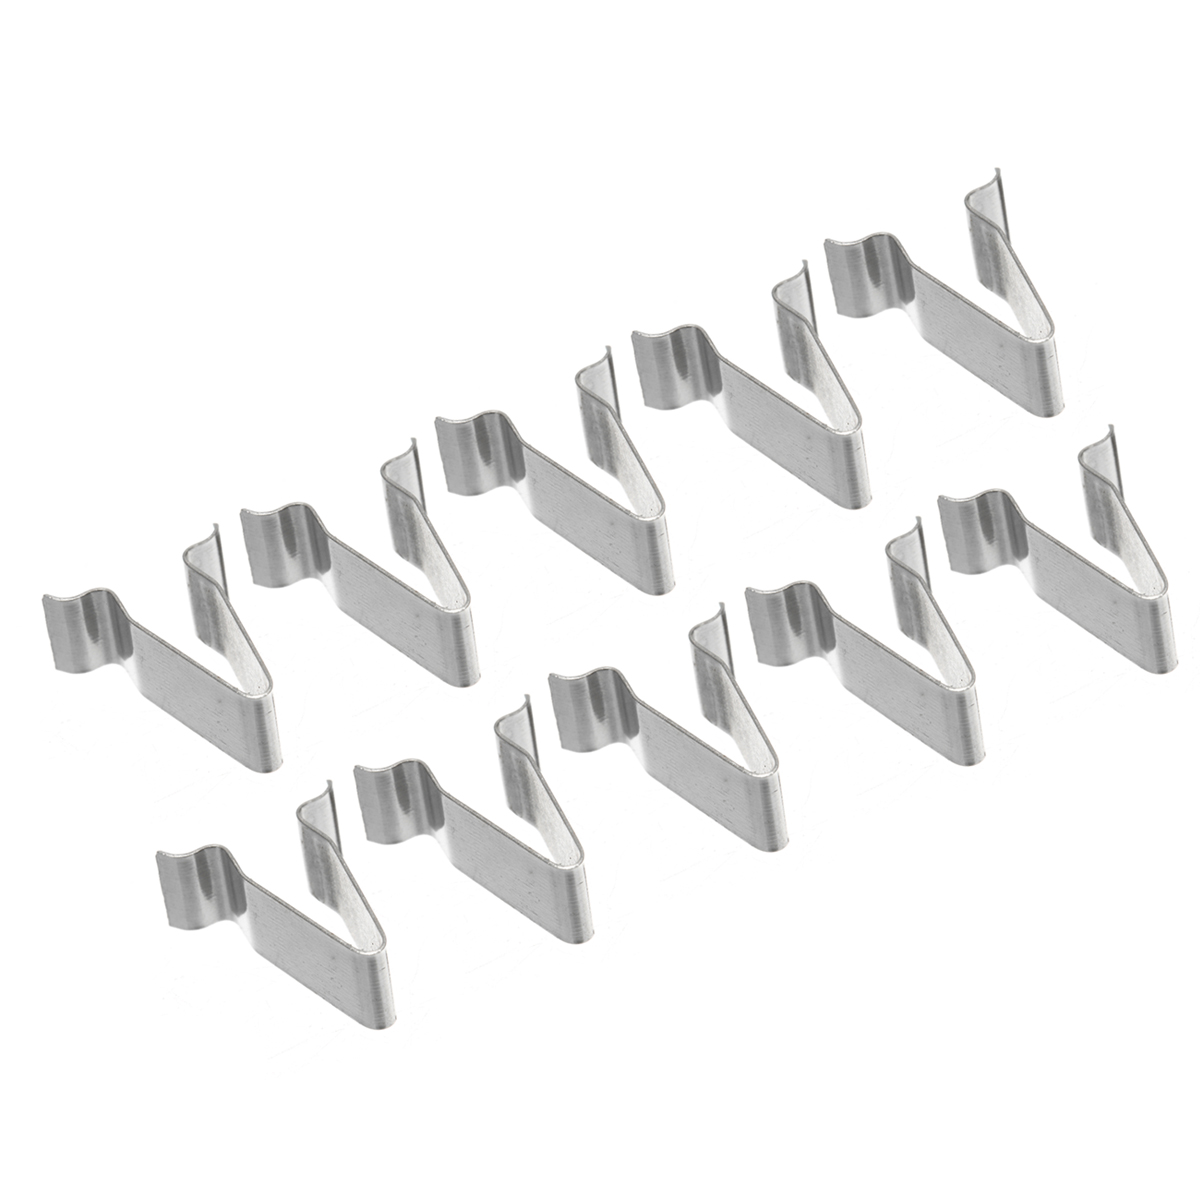 10pcs/set 22mm Metal Spring Trim Clip Car Retainer Rivet Fastener Clip For Audi Boot 4A0867276